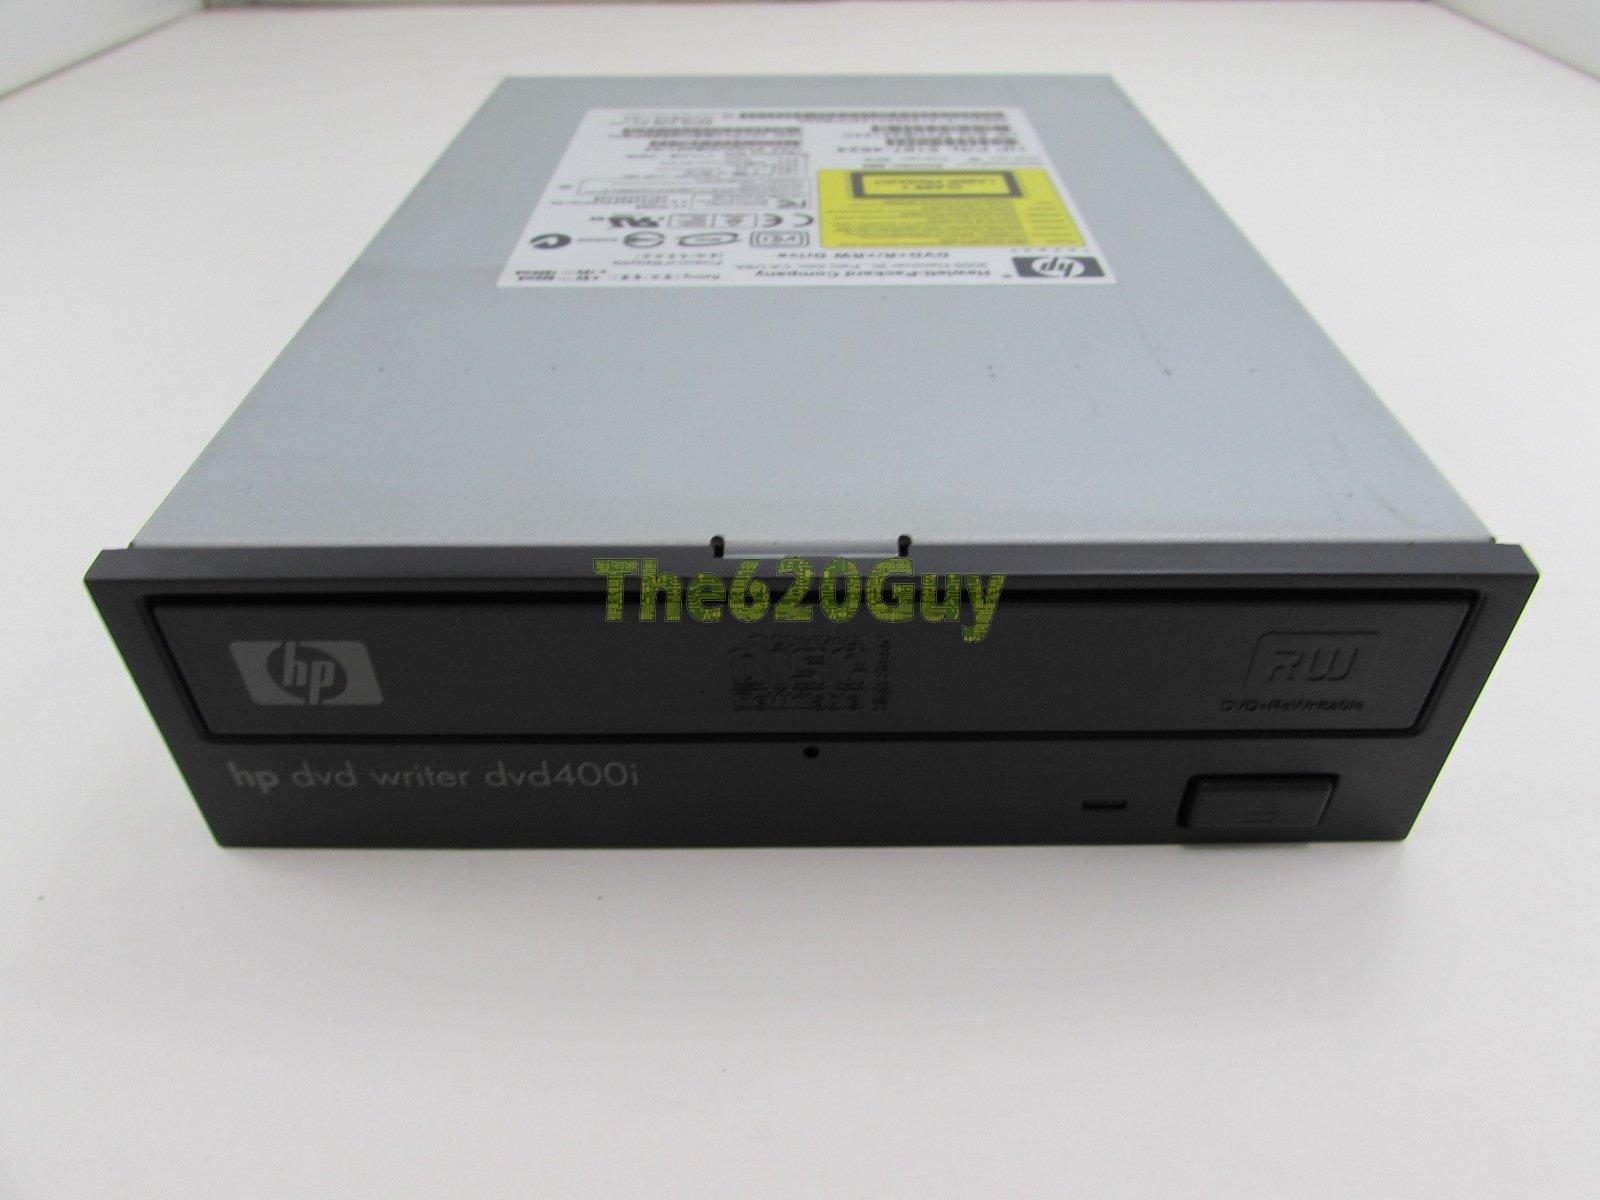 DVD WRITER DVD200I DRIVER UPDATE